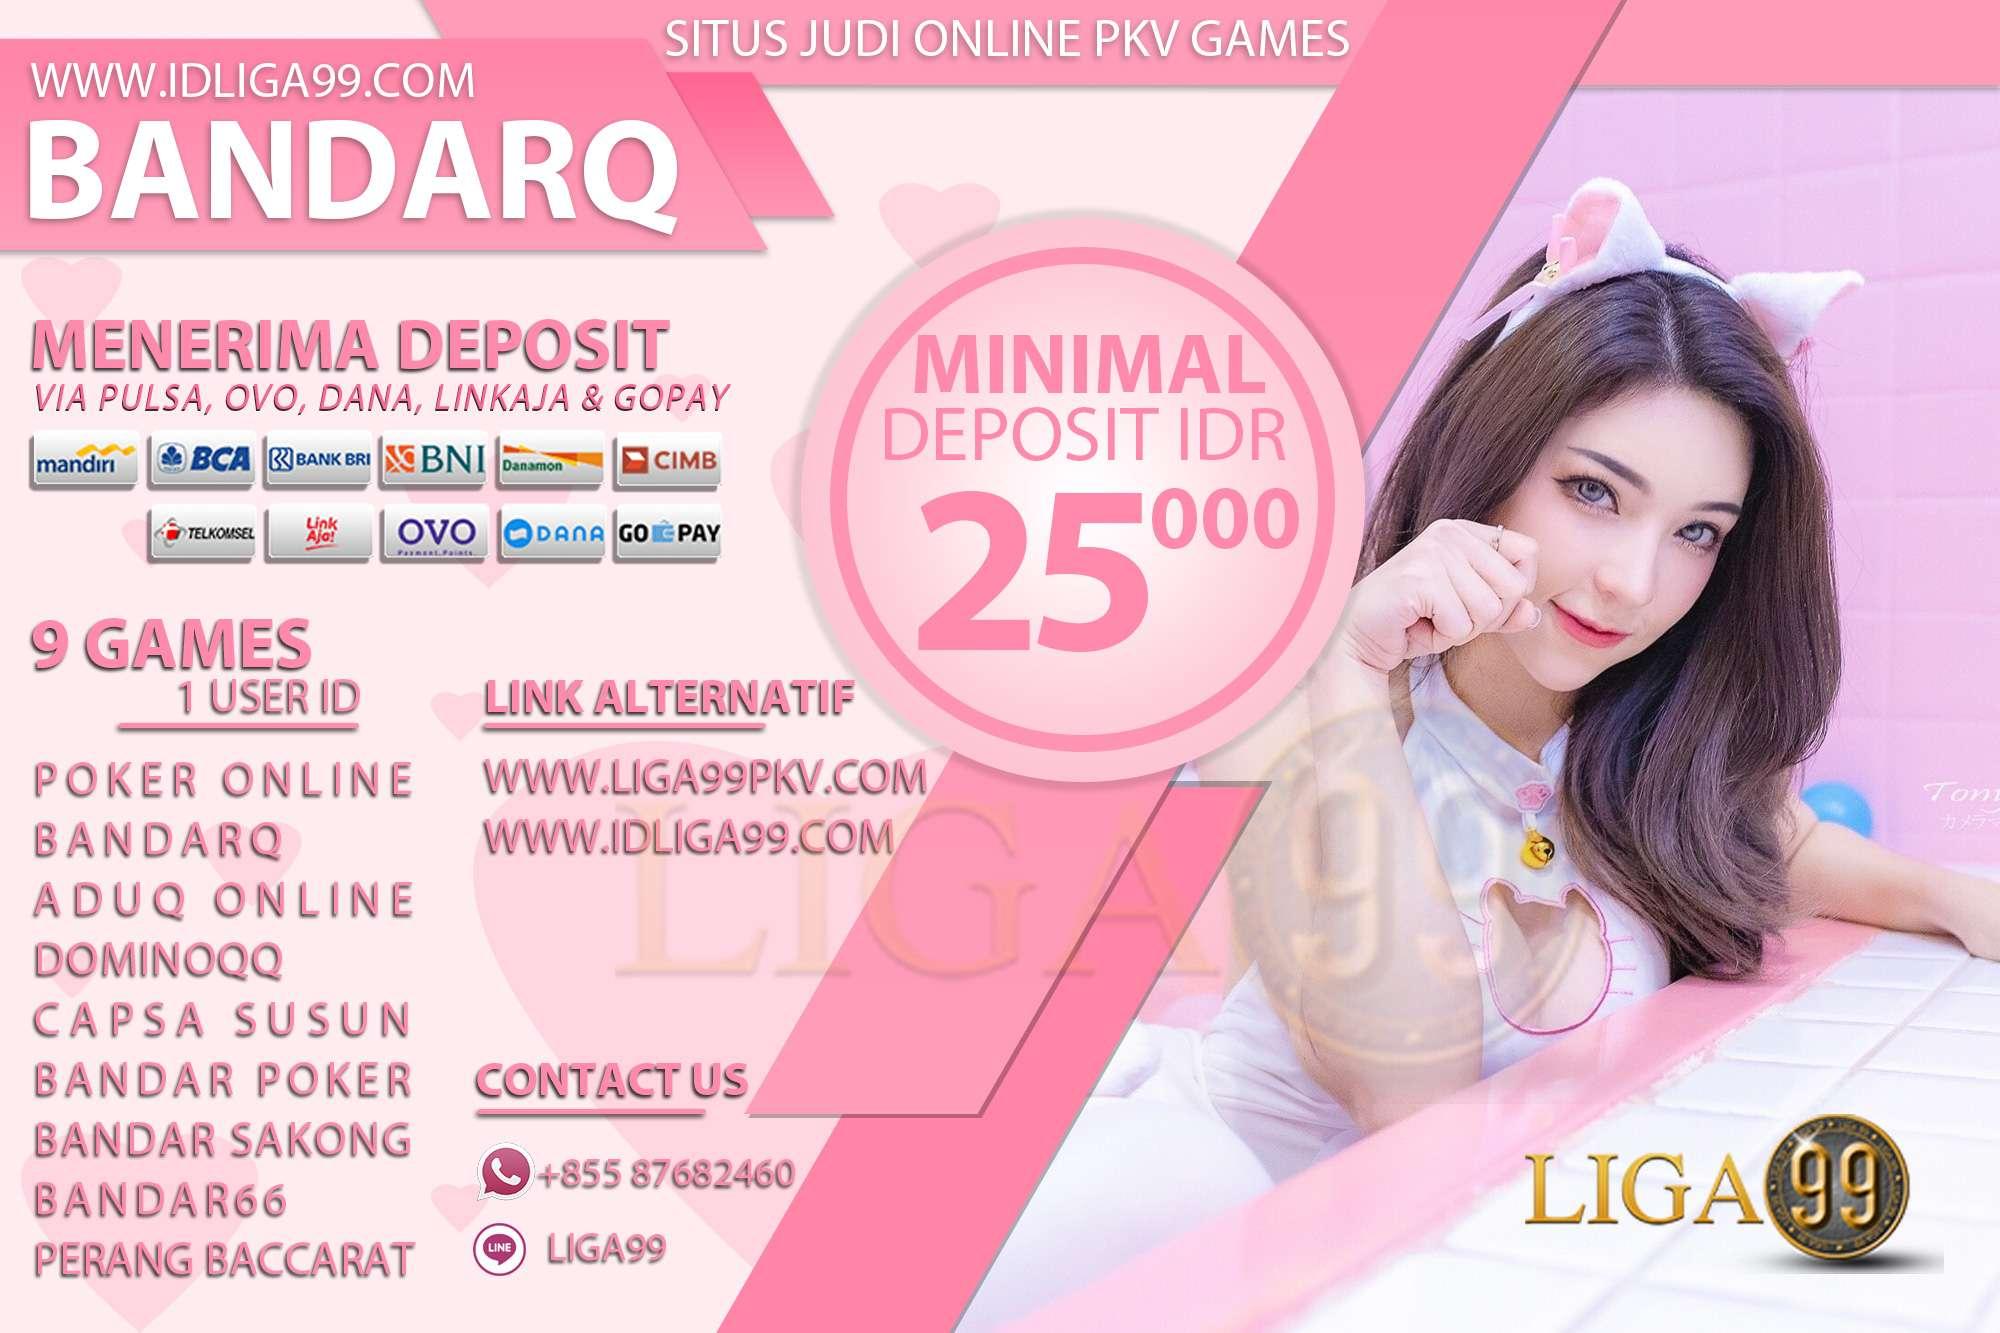 Agen Judi Poker Qq Online Pkv Games